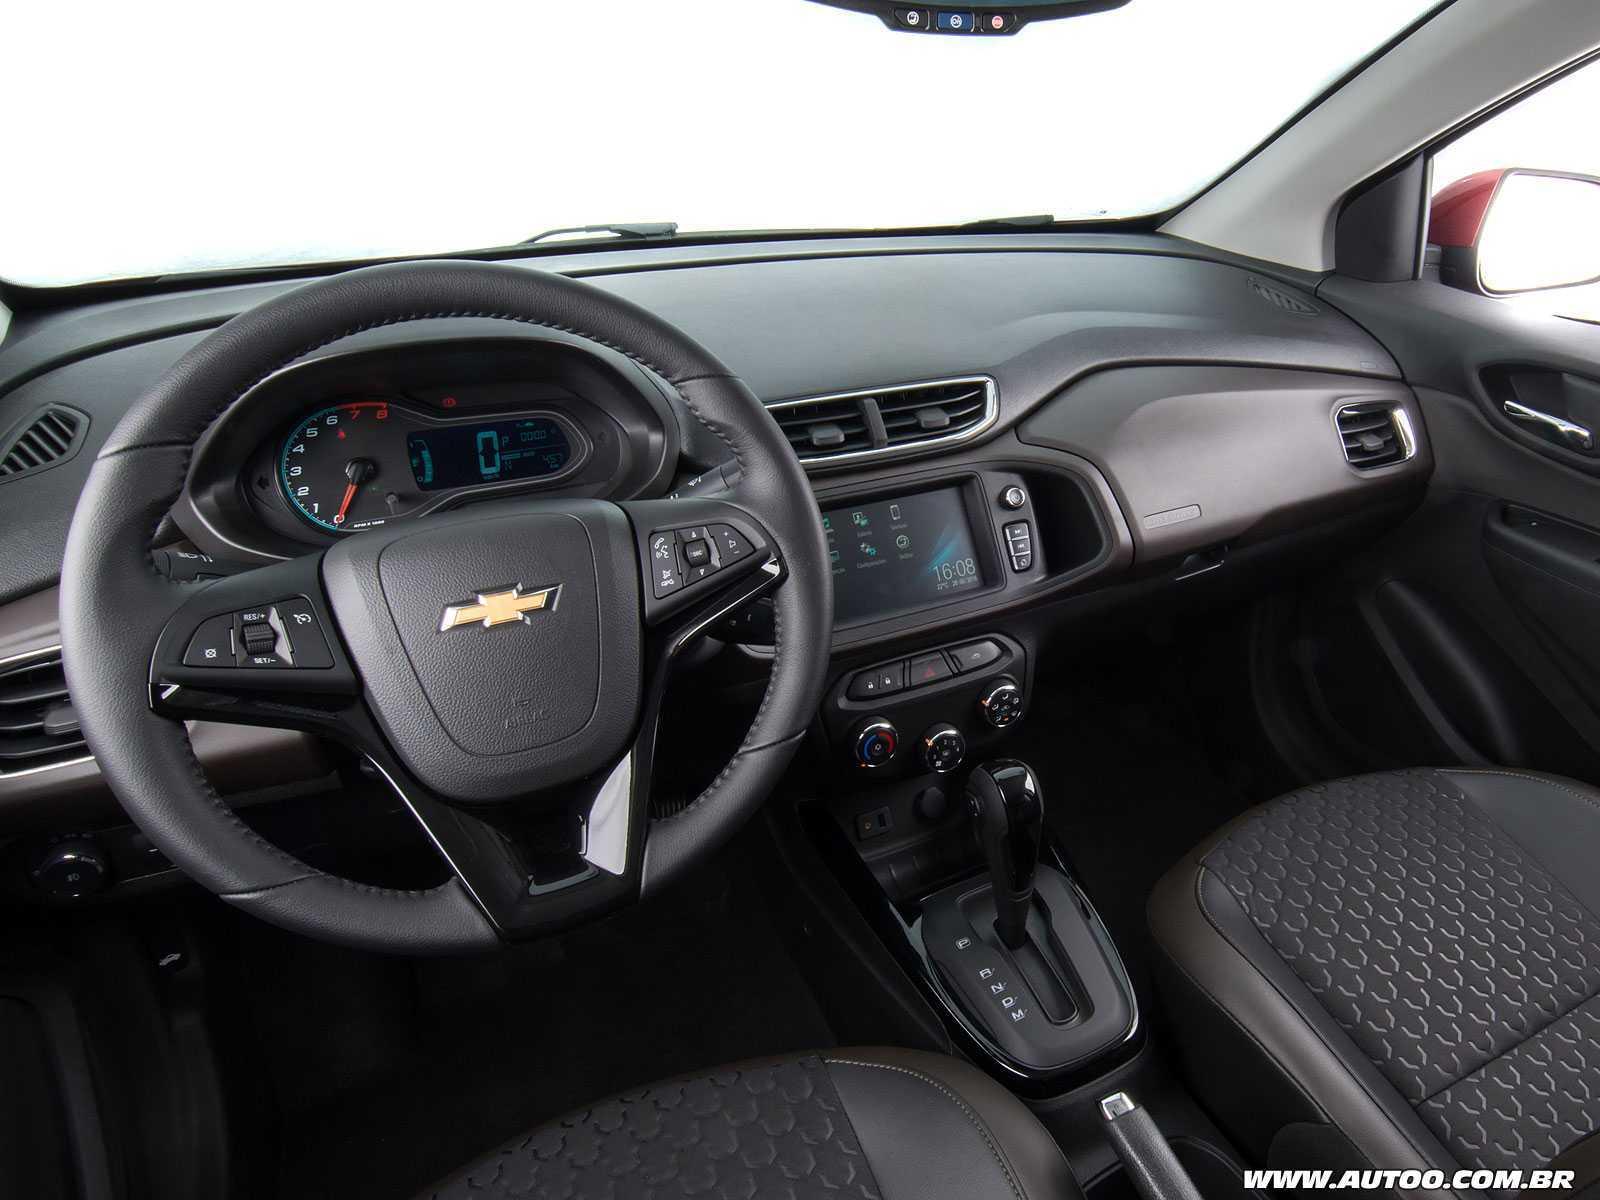 ChevroletPrisma 2017 - painel